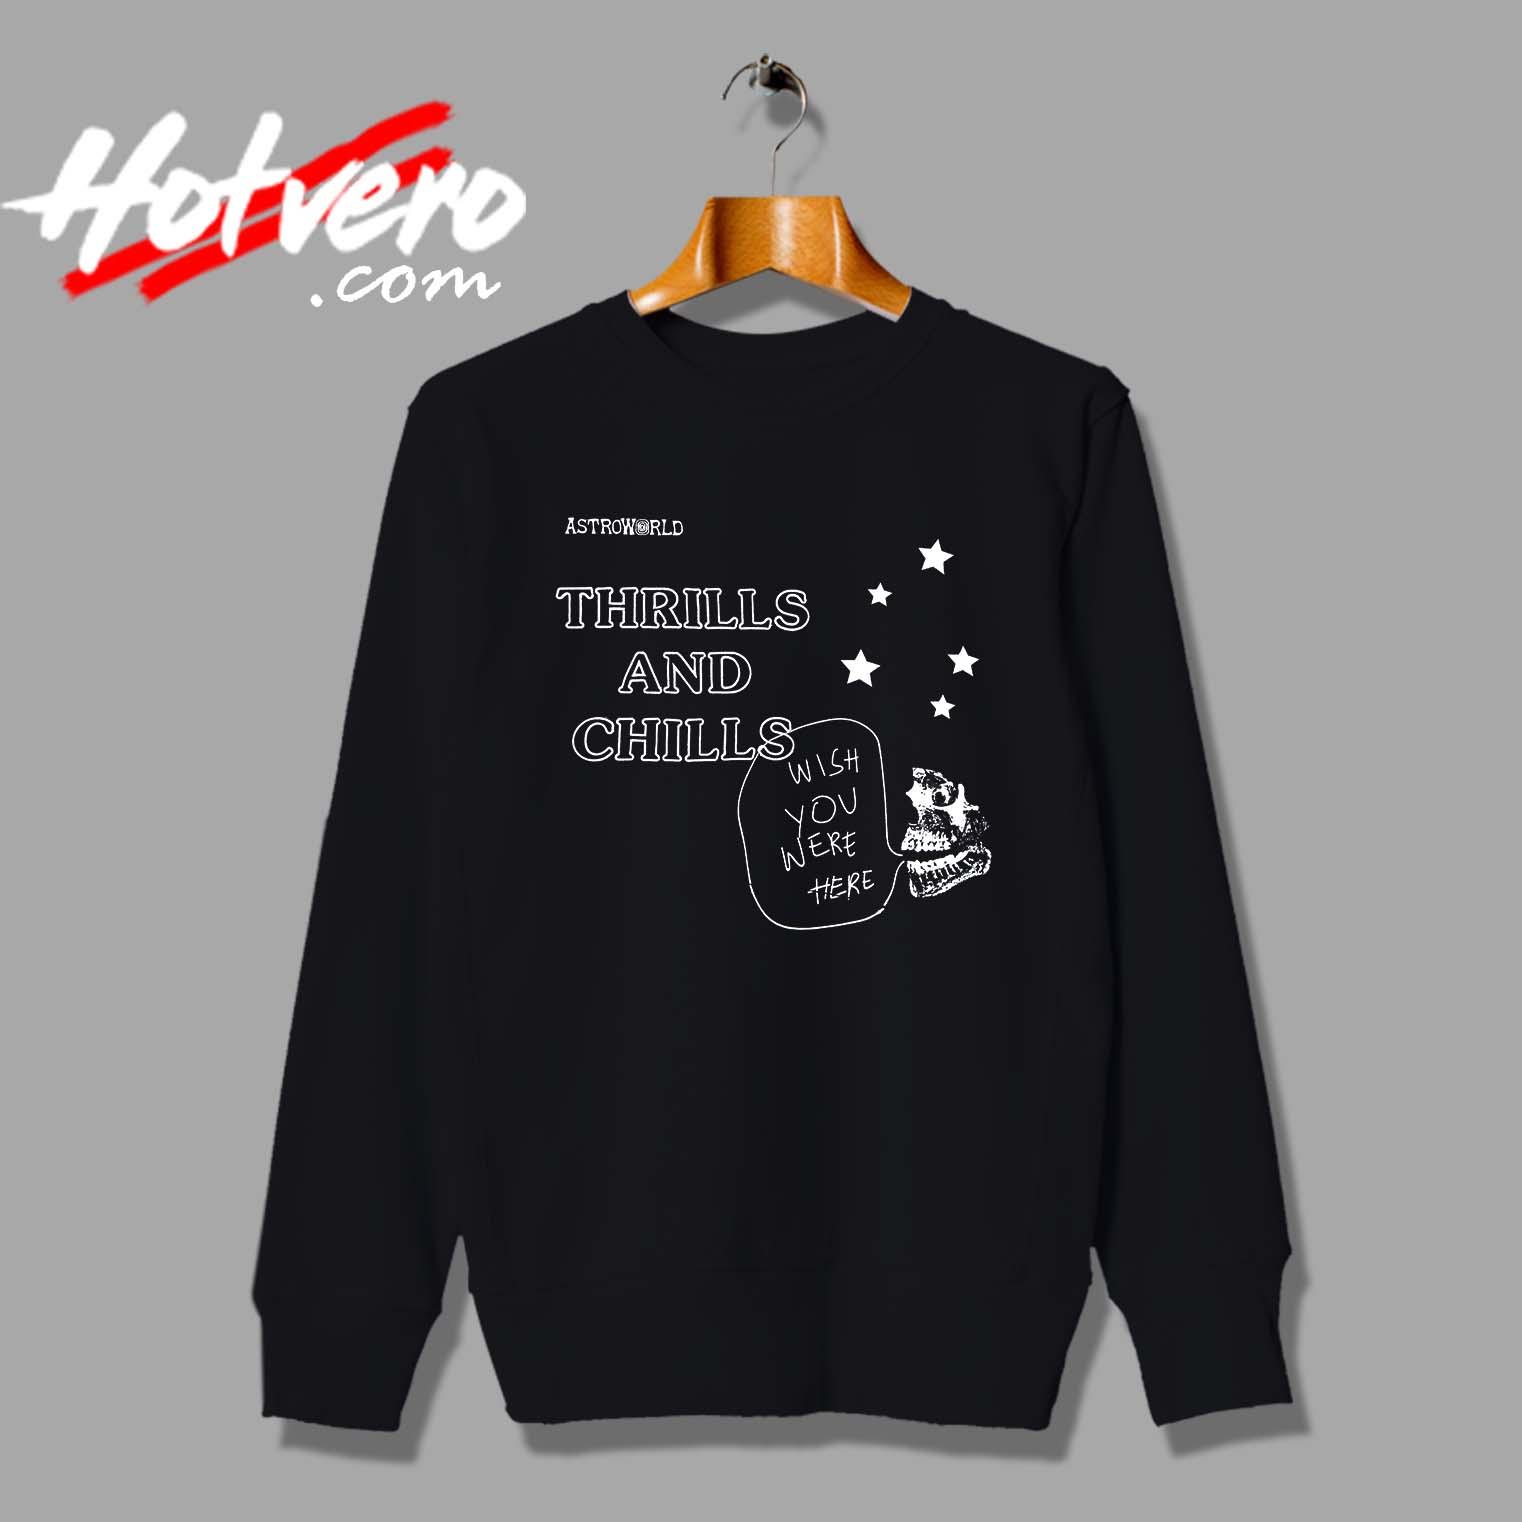 40c3a0b28650 Travis Scott Astroworld Thrills And Chills Custom Sweatshirt - Hotvero